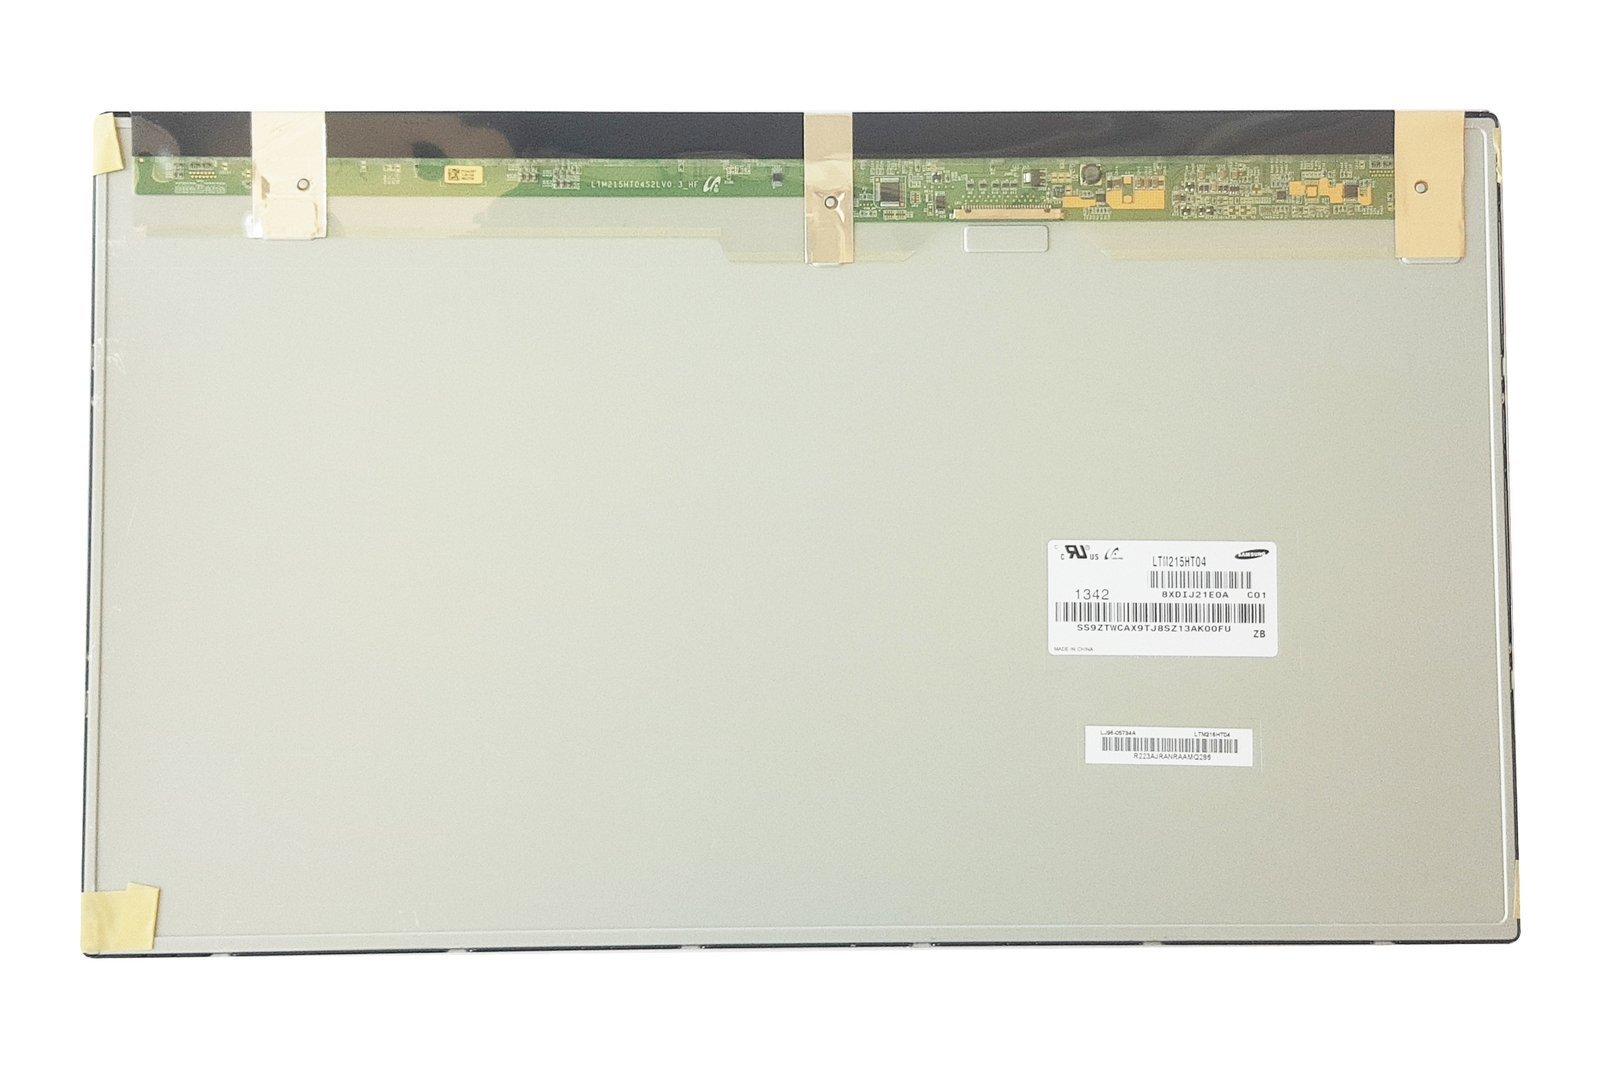 Bildschirm Display Samsung 21.5' LTM215HT04 1920 x 1080